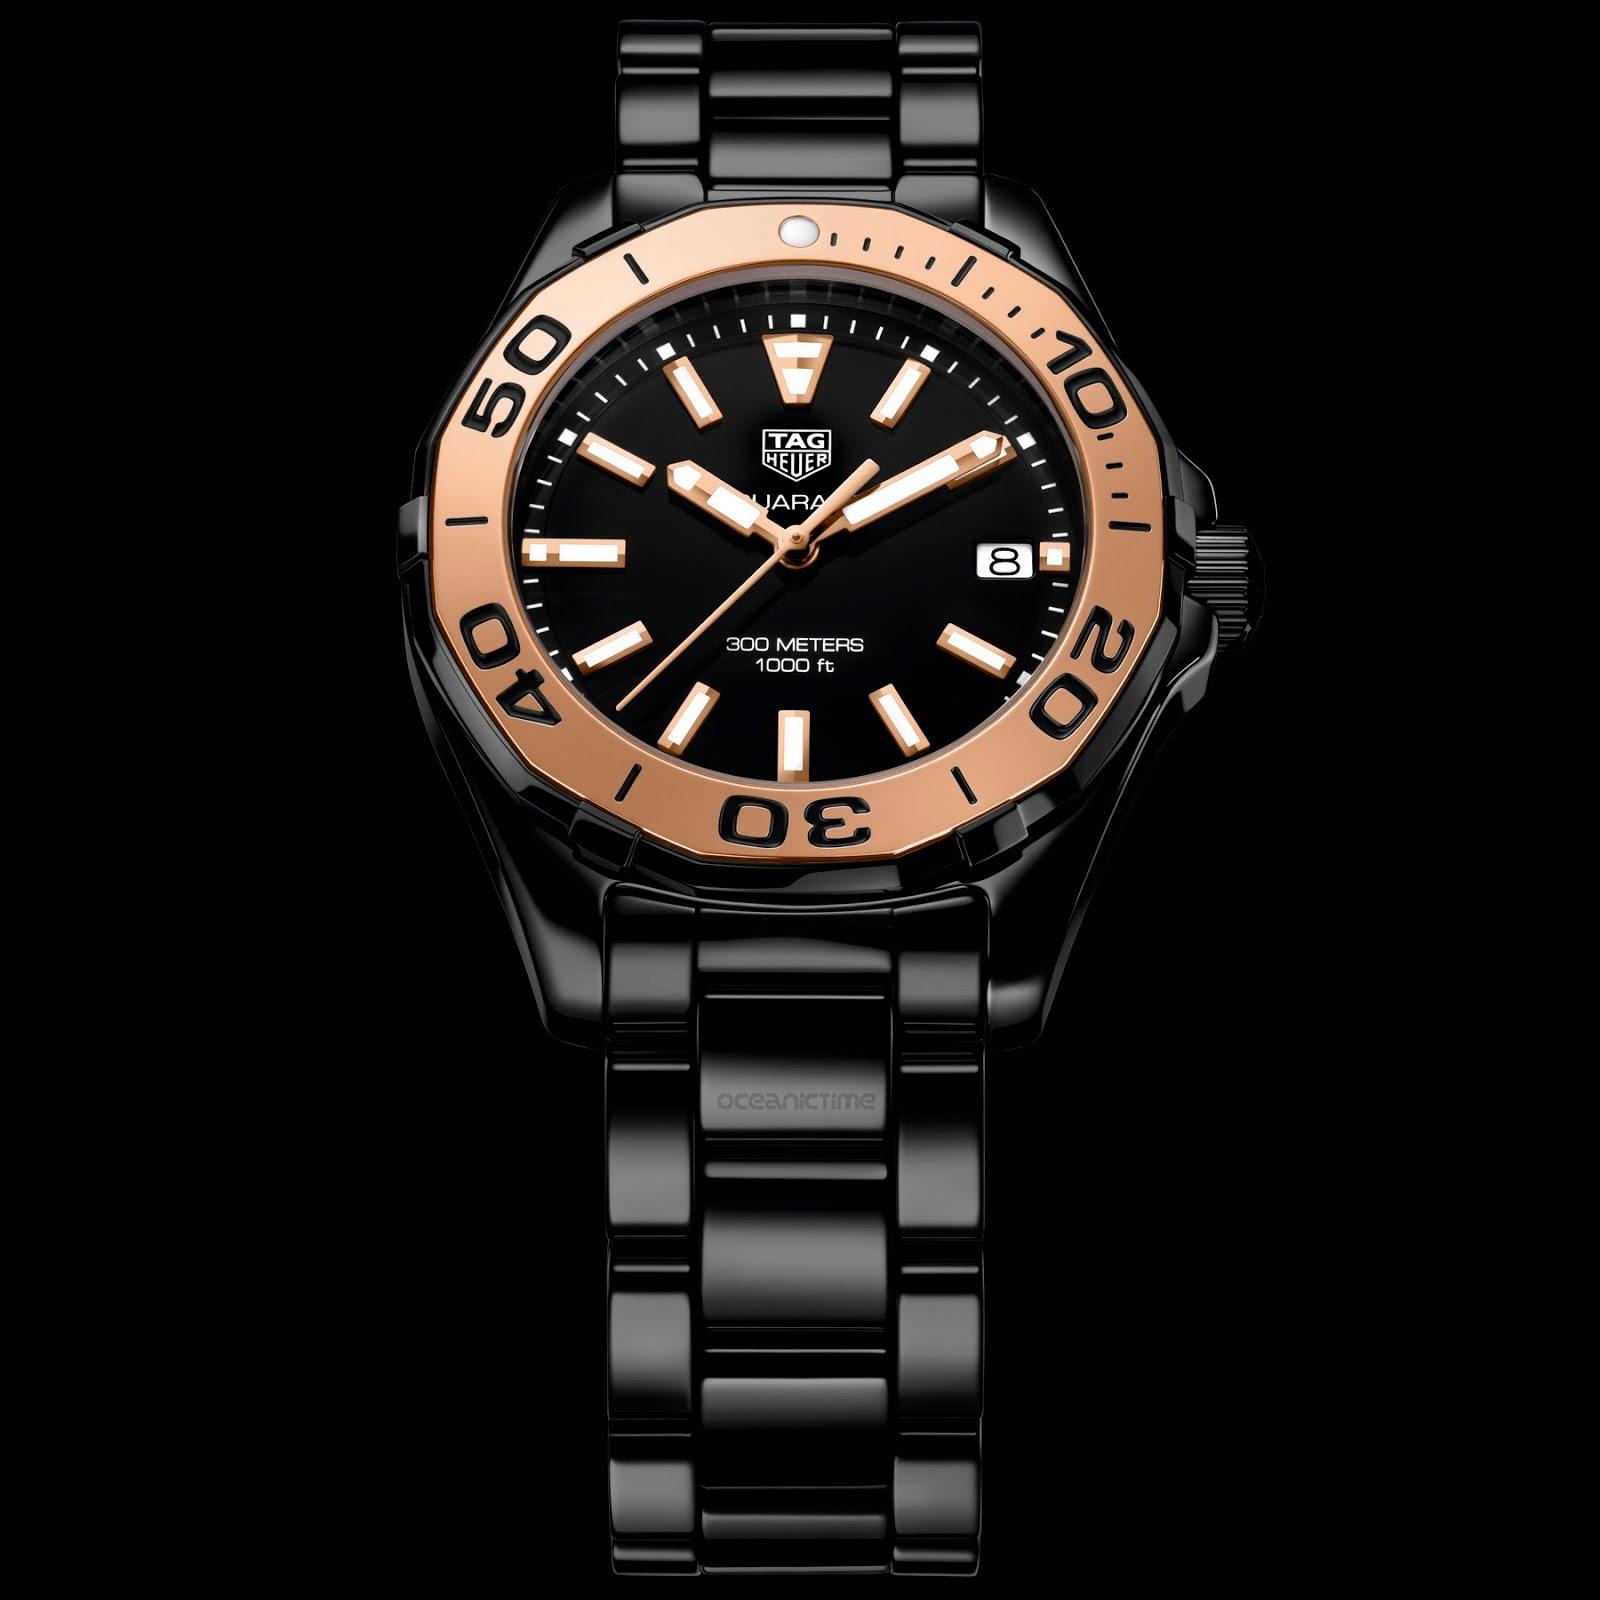 aa588a85122 OceanicTime - TAG Heuer Aquaracer LADY 300M Full Ceramic GOLD